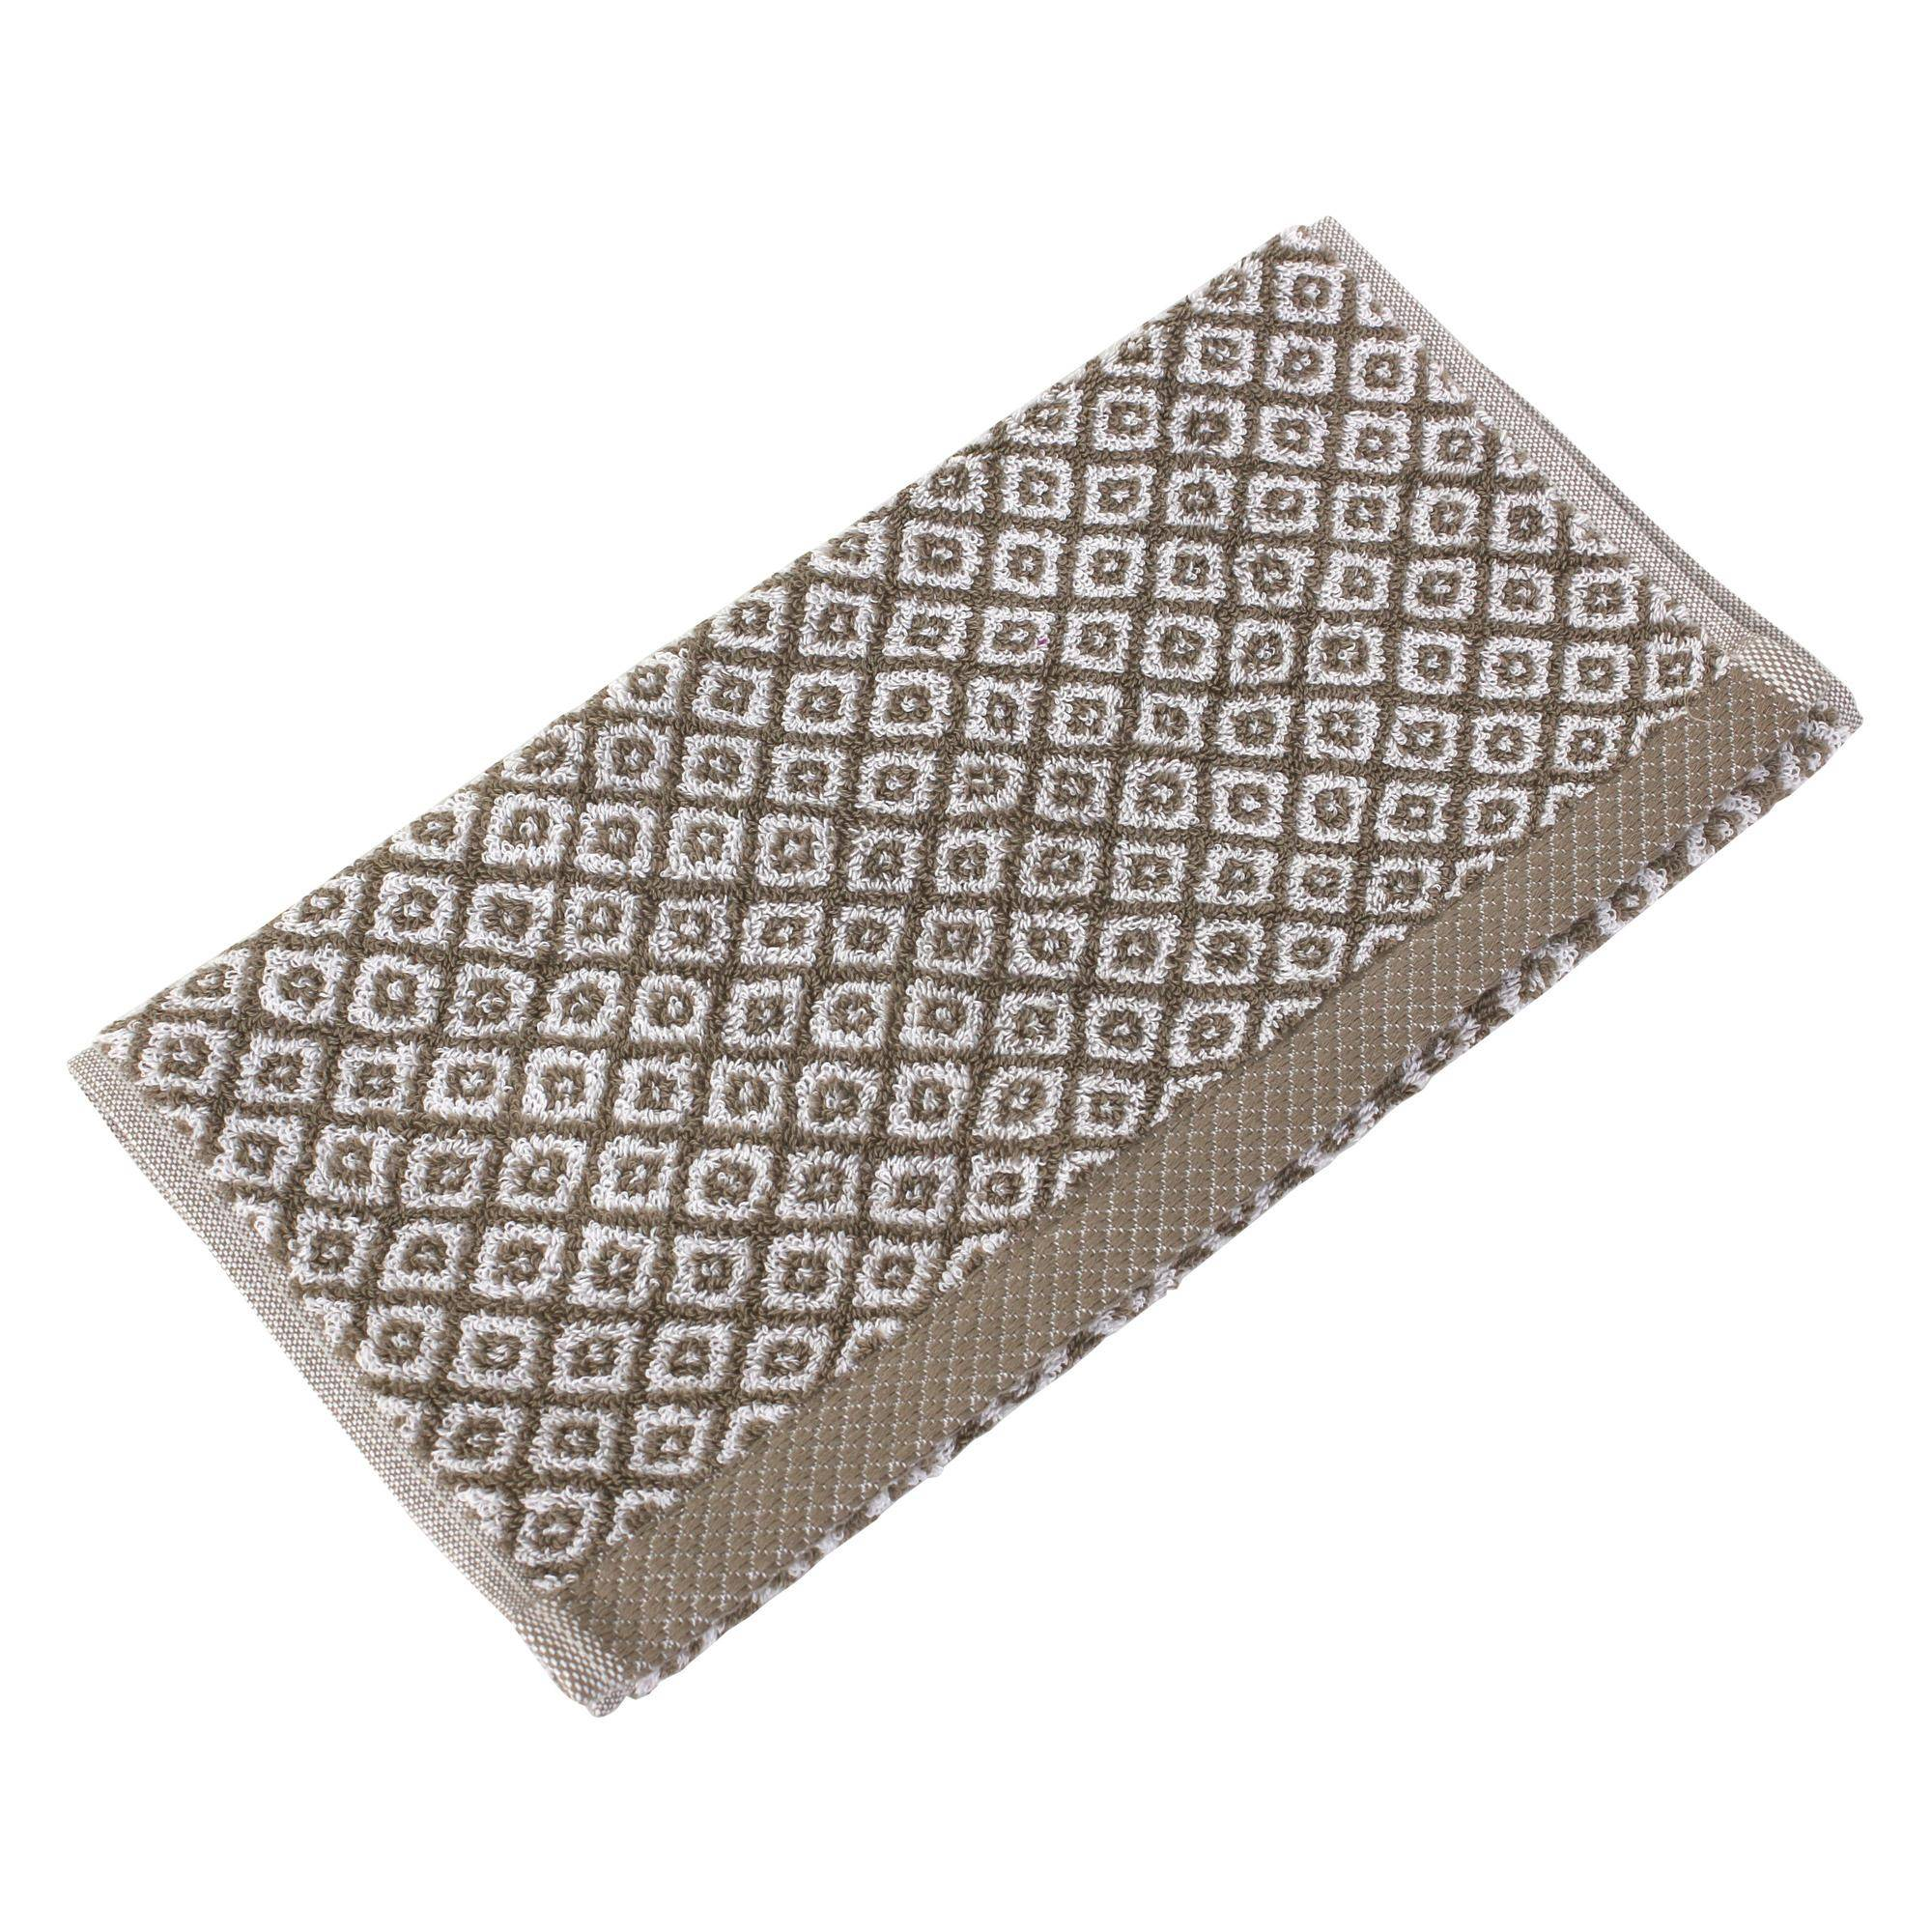 Linnea Serviette invité 33x50 cm SHIBORI mosaic Beige 500 g/m2